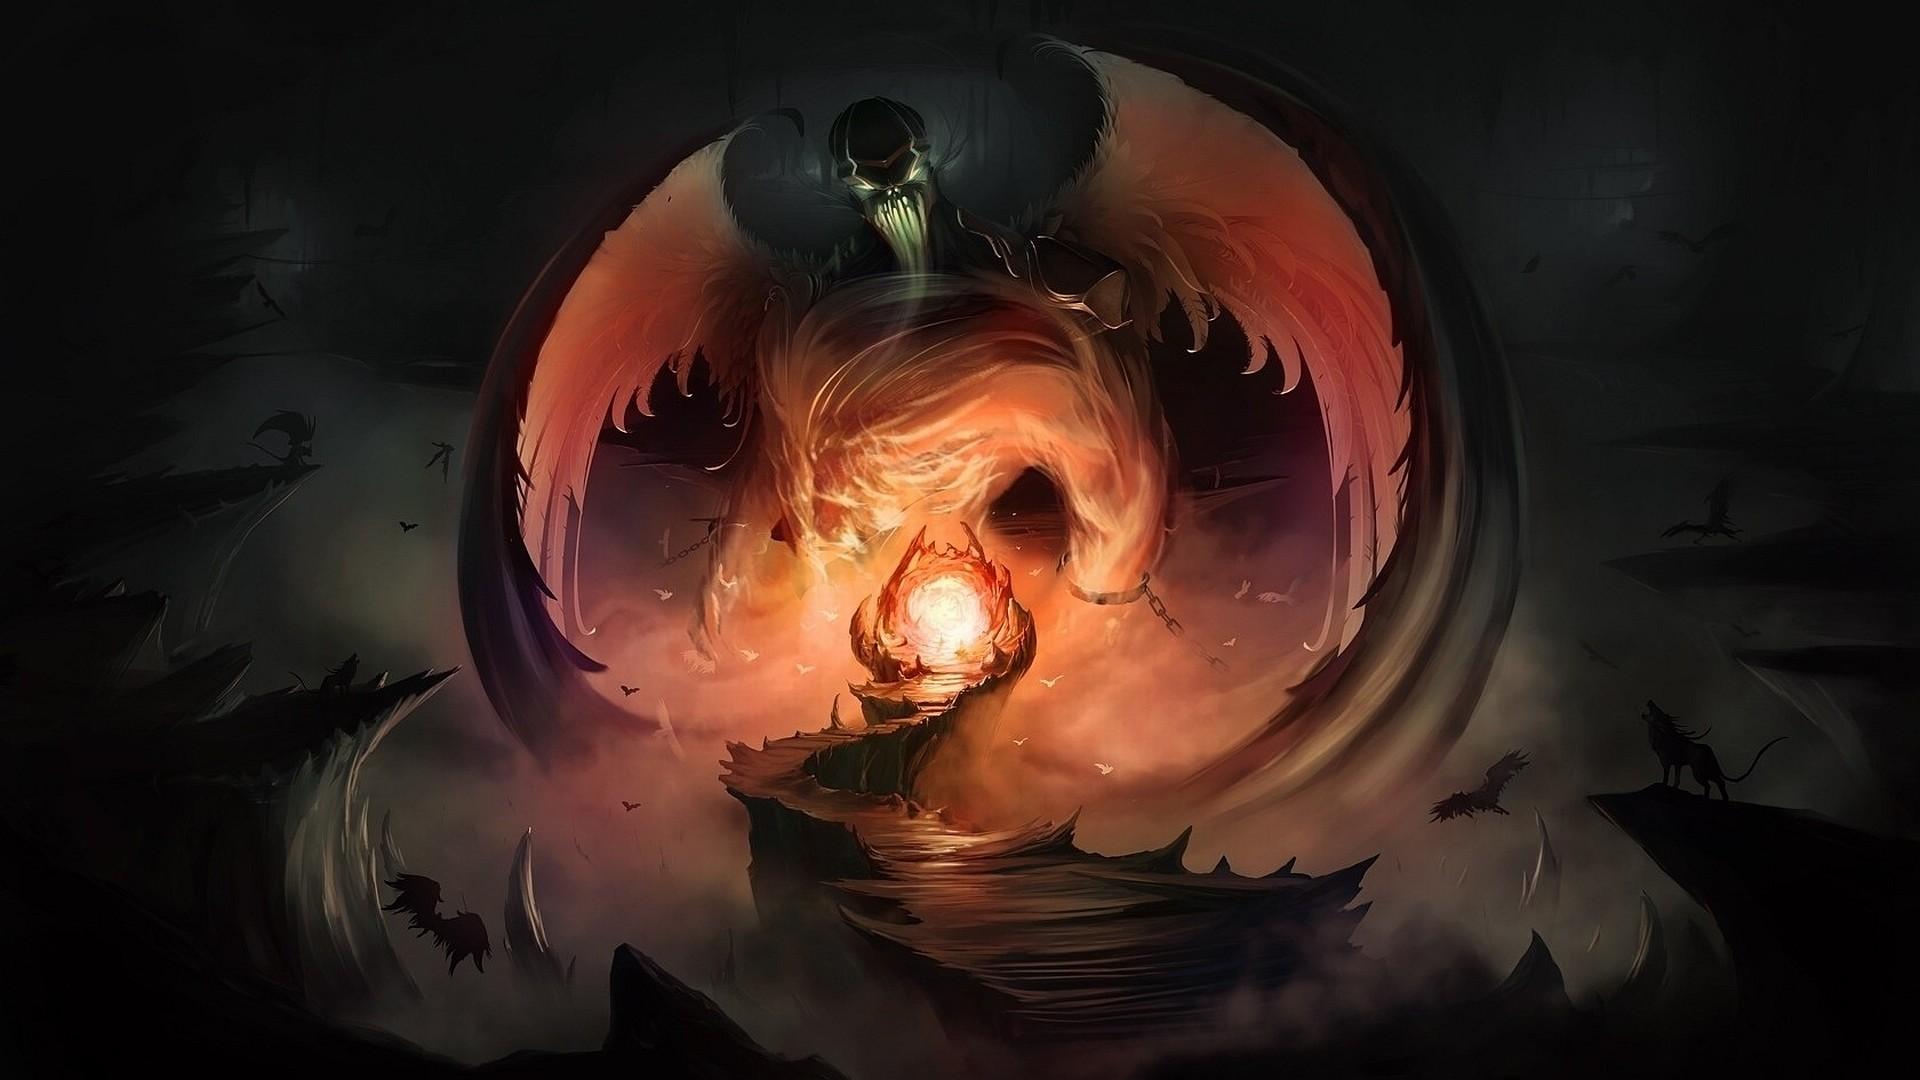 Res: 1920x1080, Church Of Satan Wallpaper Demon hell satan wallpaper